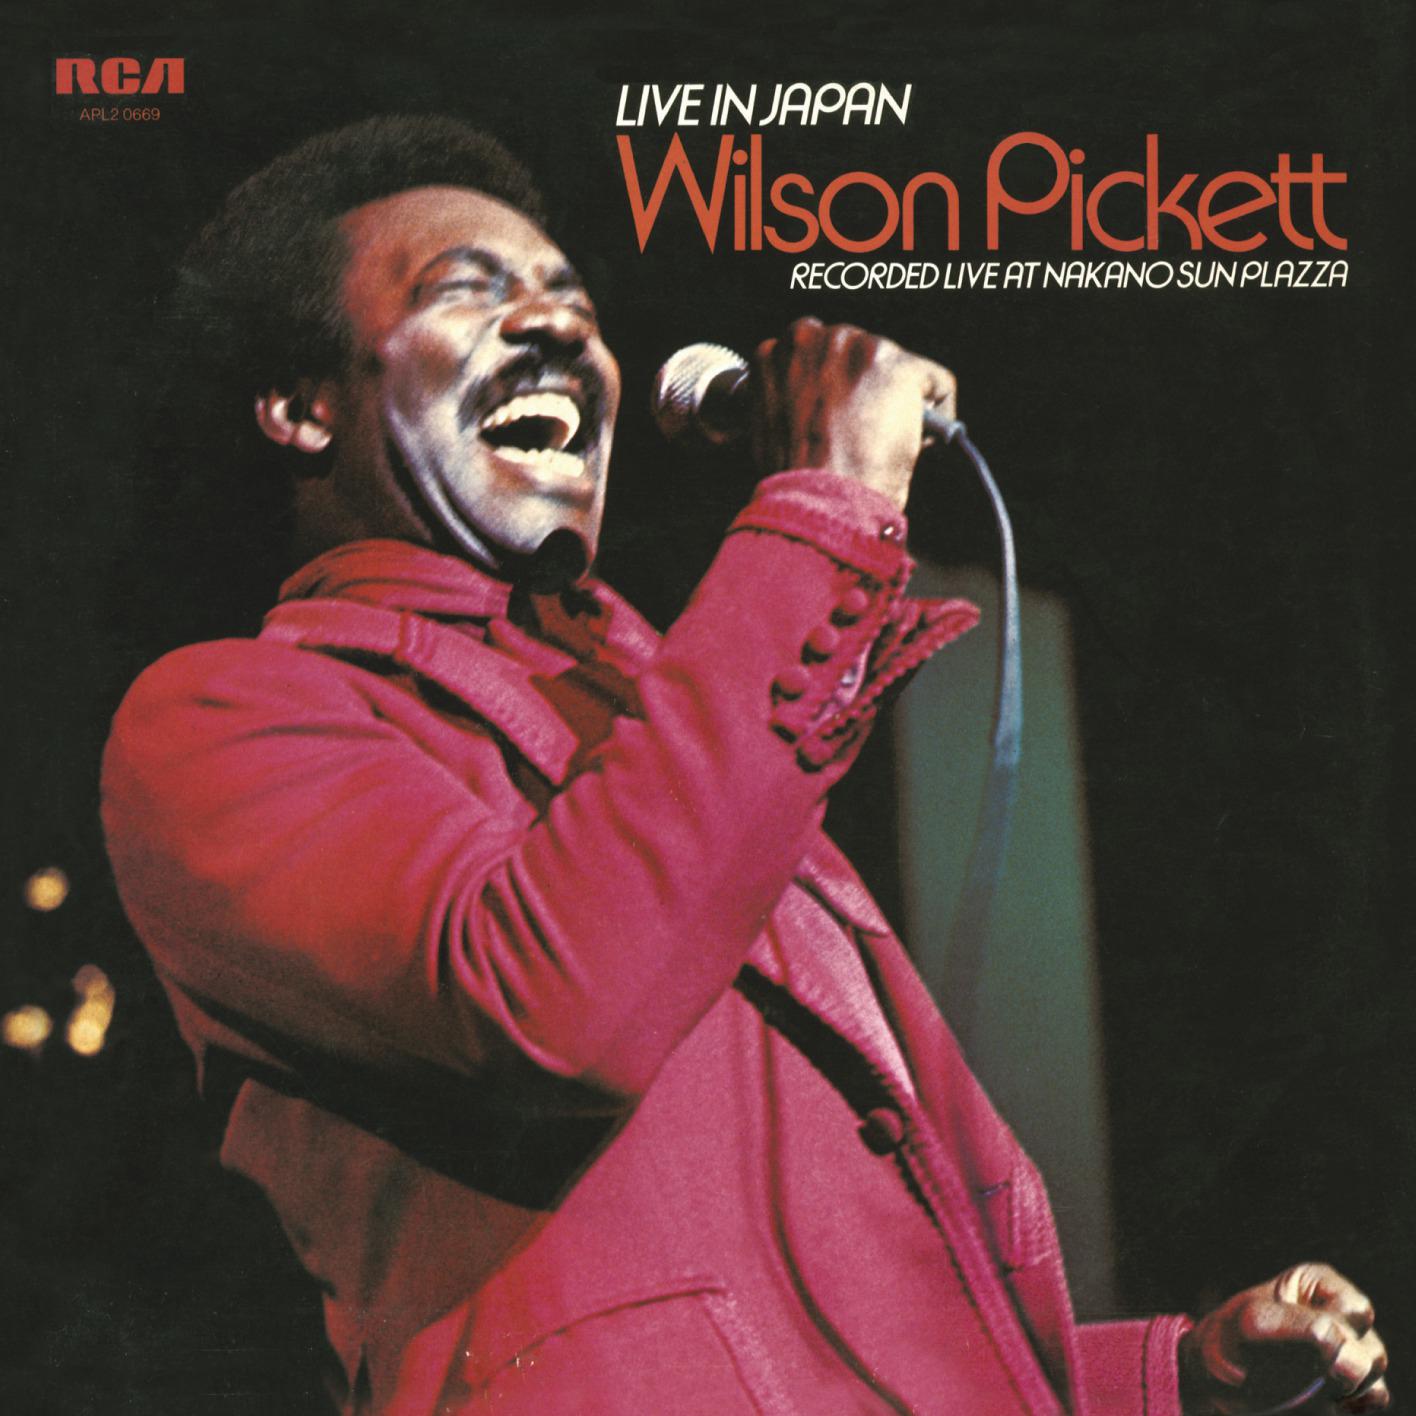 Wilson Pickett - Live In Japan (1974/2014) [Official Digital Download 24-bit/96 kHz]